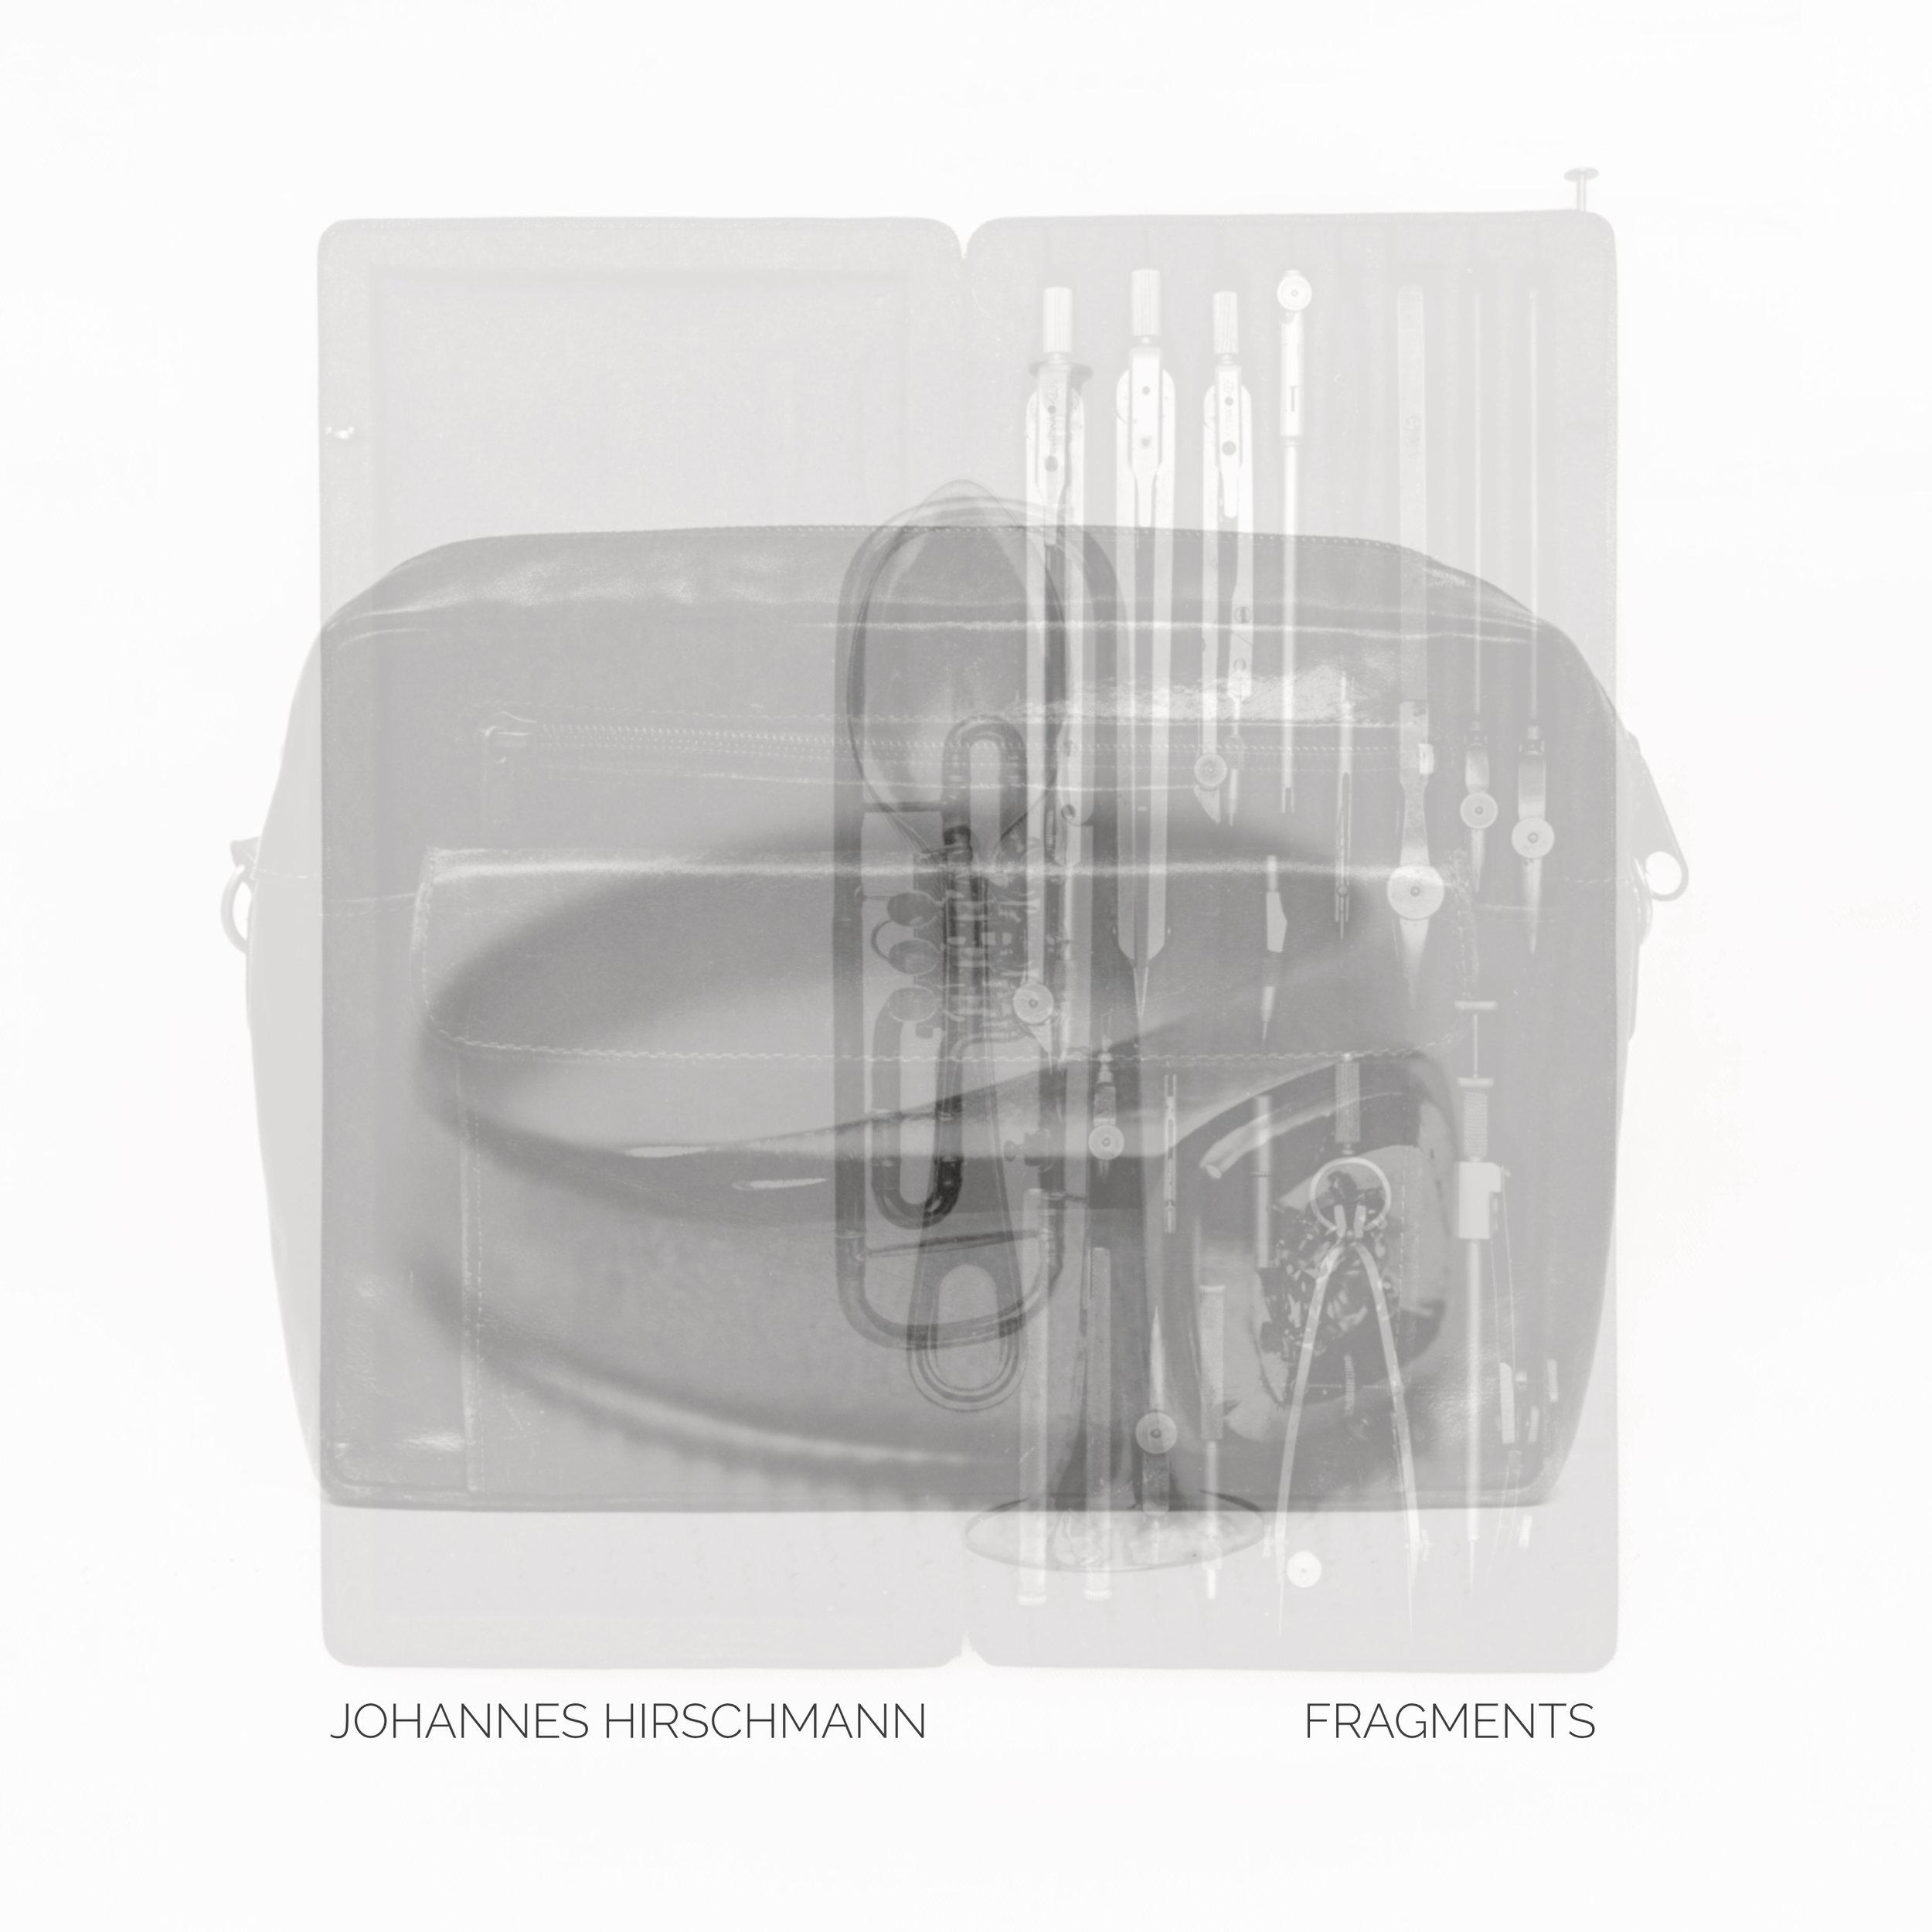 johannes-hirschmann_fragments_front_3000x3000_srgb.jpg